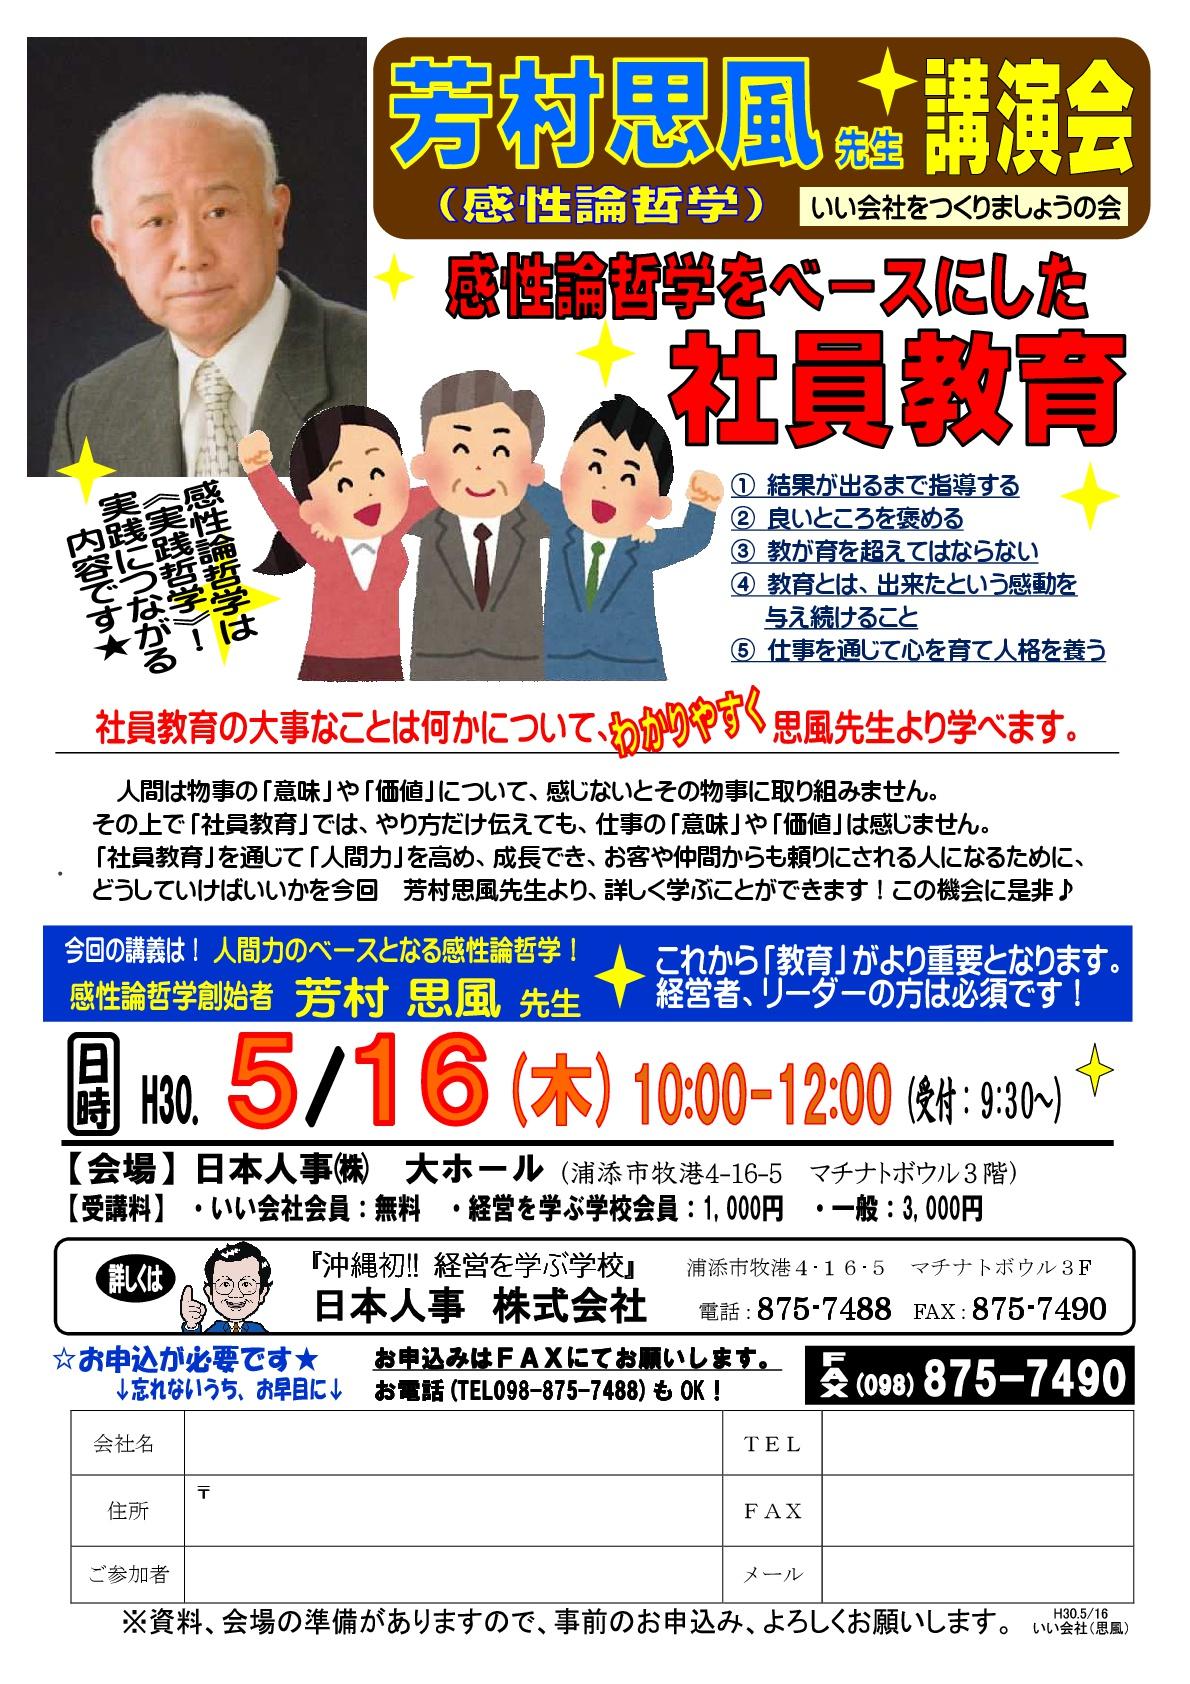 o1190168414190689551 - 5月16日(水)沖縄講演会